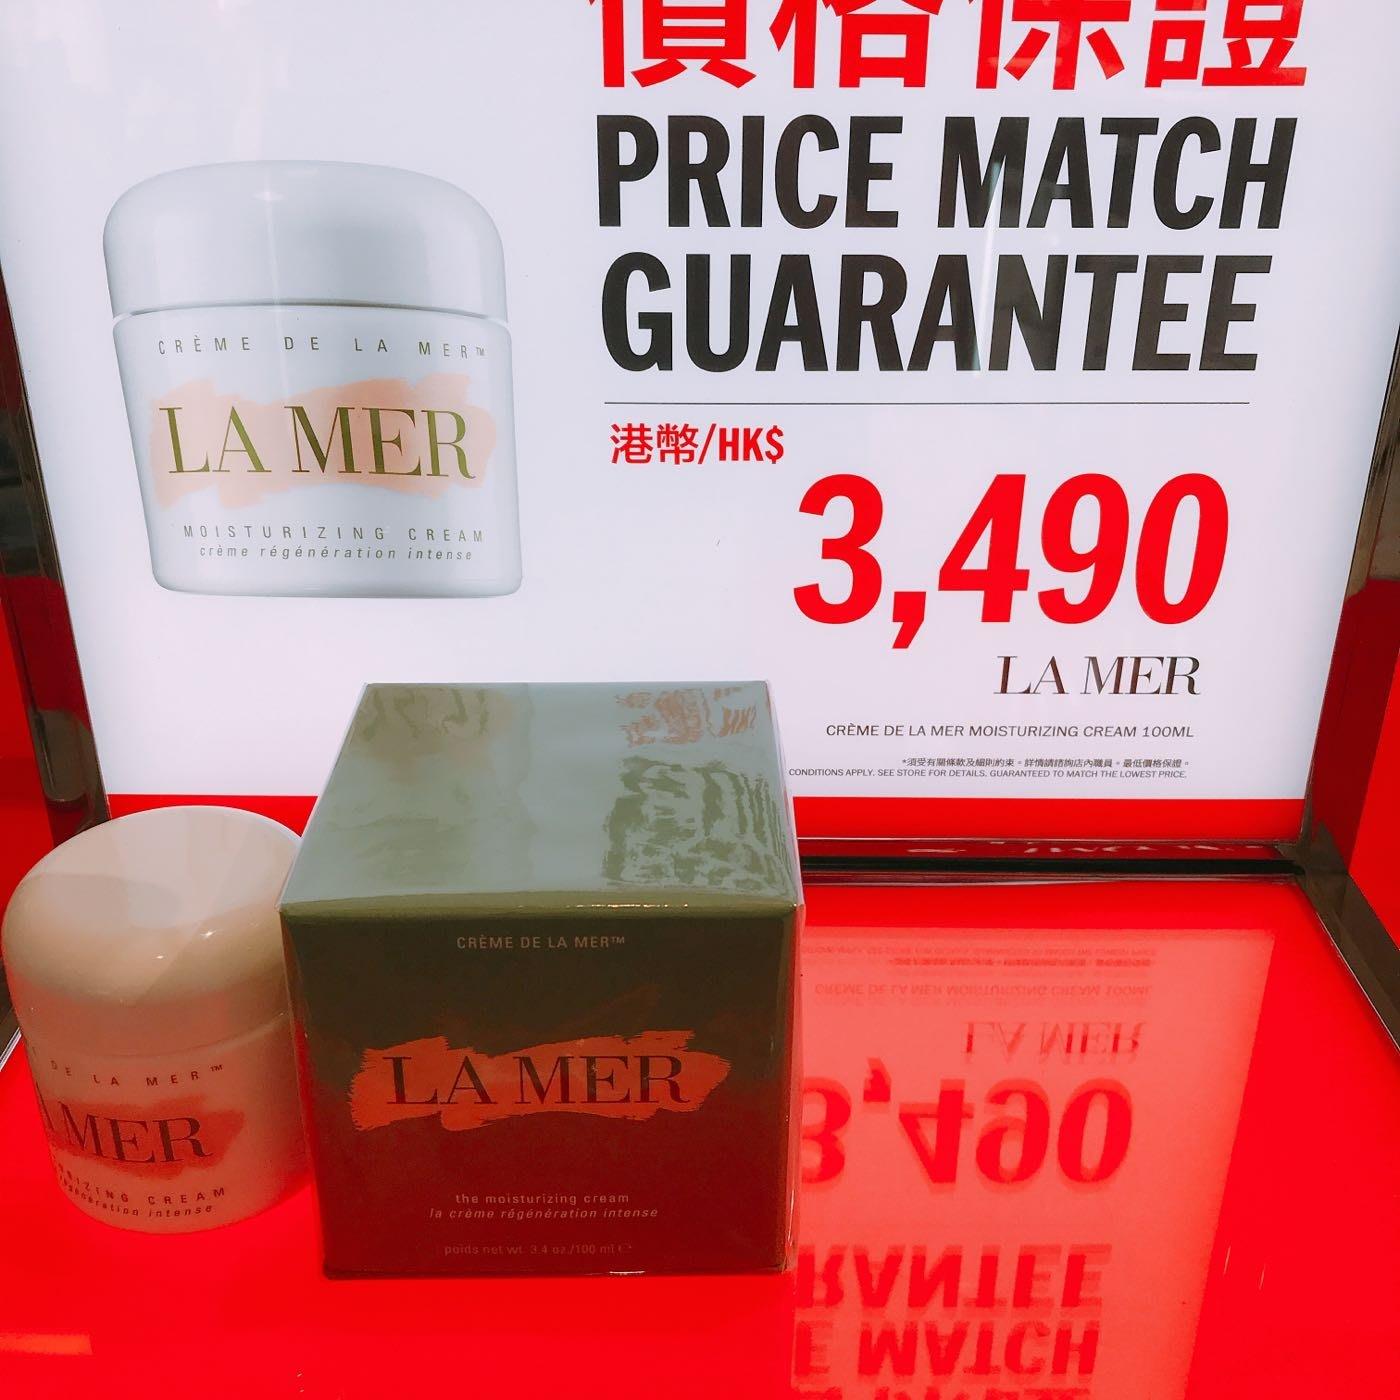 3400 Lamer Moisturizing Cream 100ml Size Yahoo La Mer Creme De